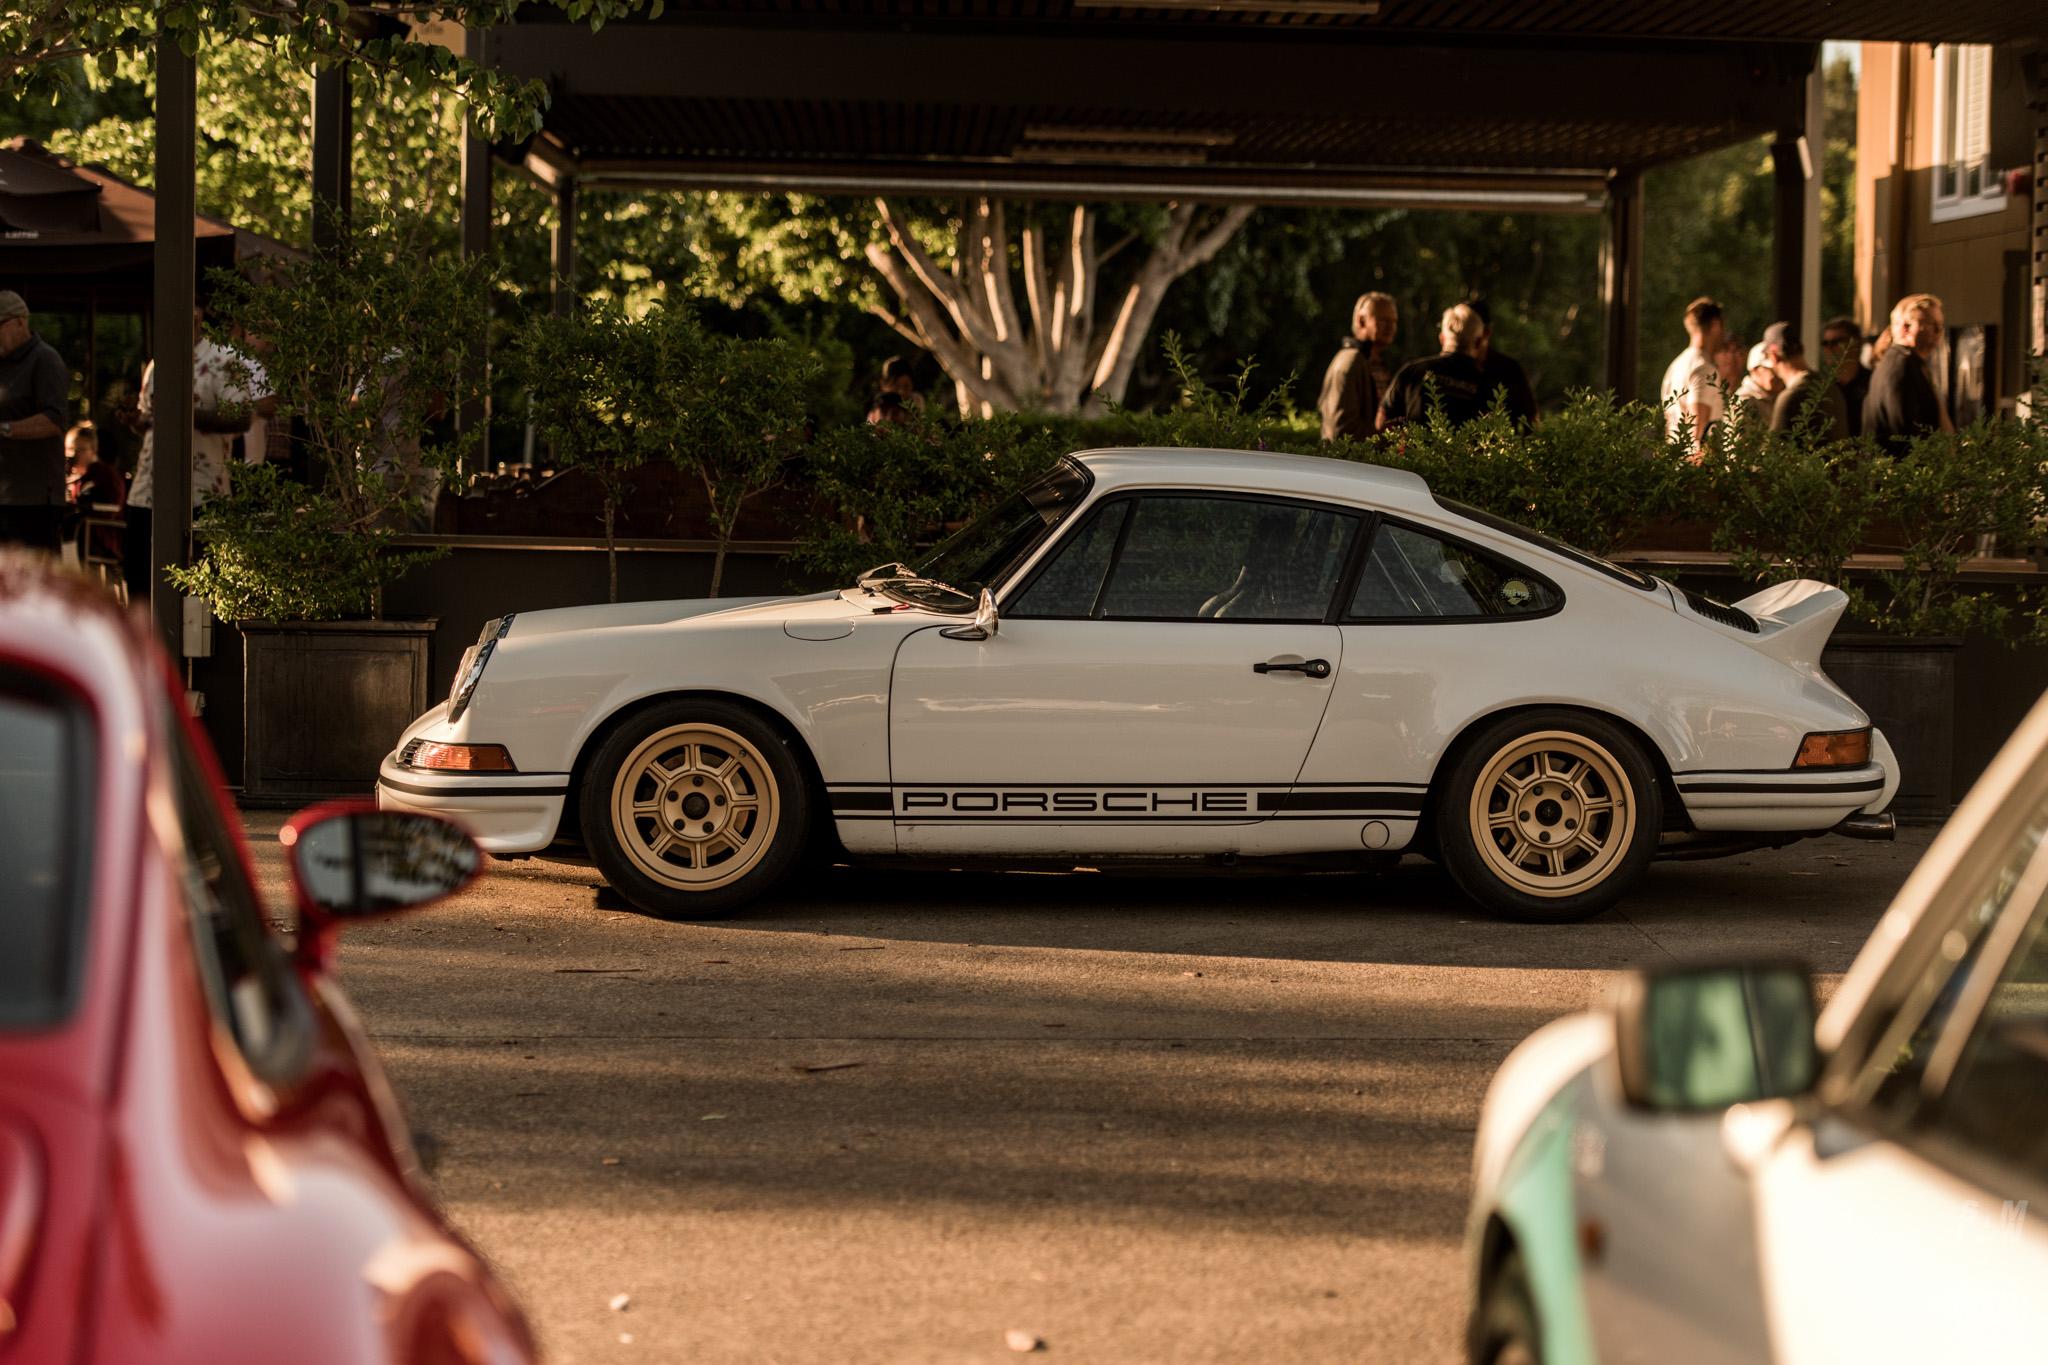 2019-10-27 - Autohaus Porsches & Coffee 054